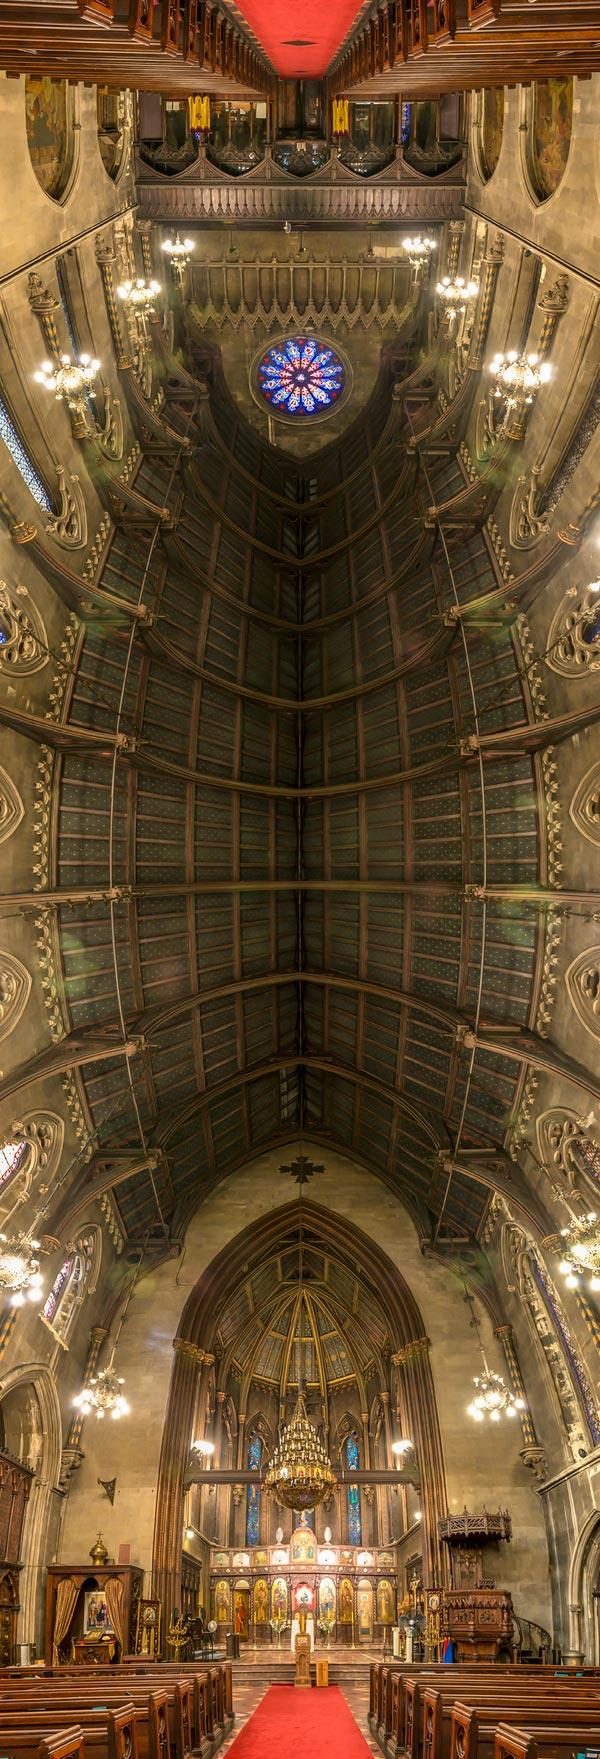 vertical panoramas of church ceilings 6 Amazing Vertical Panoramas of Church Ceilings